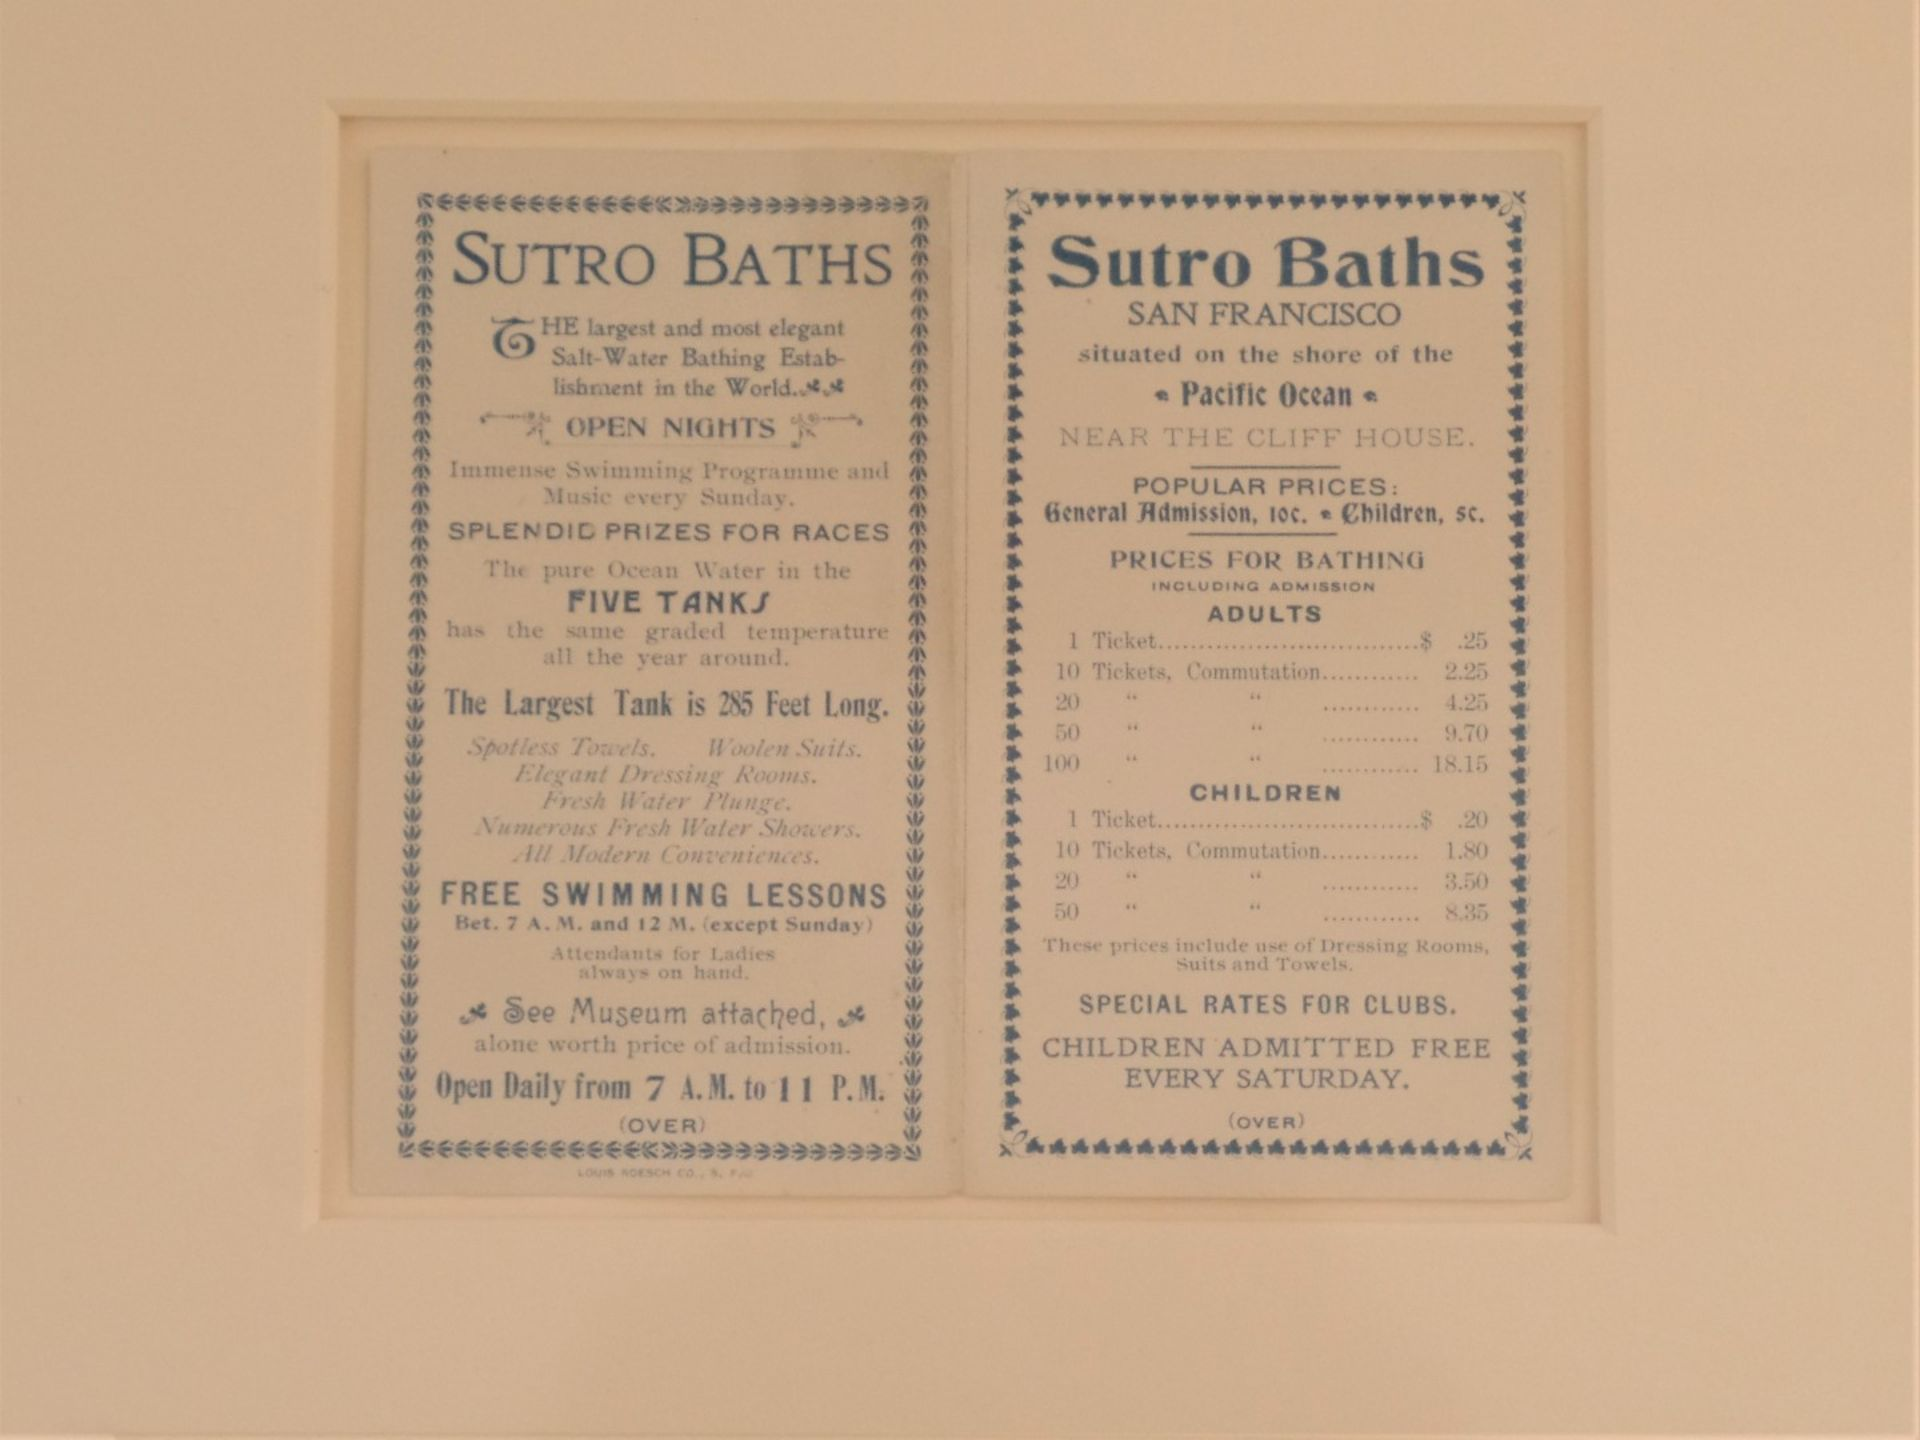 Framed Sutro Baths - Framed Mementos - Image 2 of 8